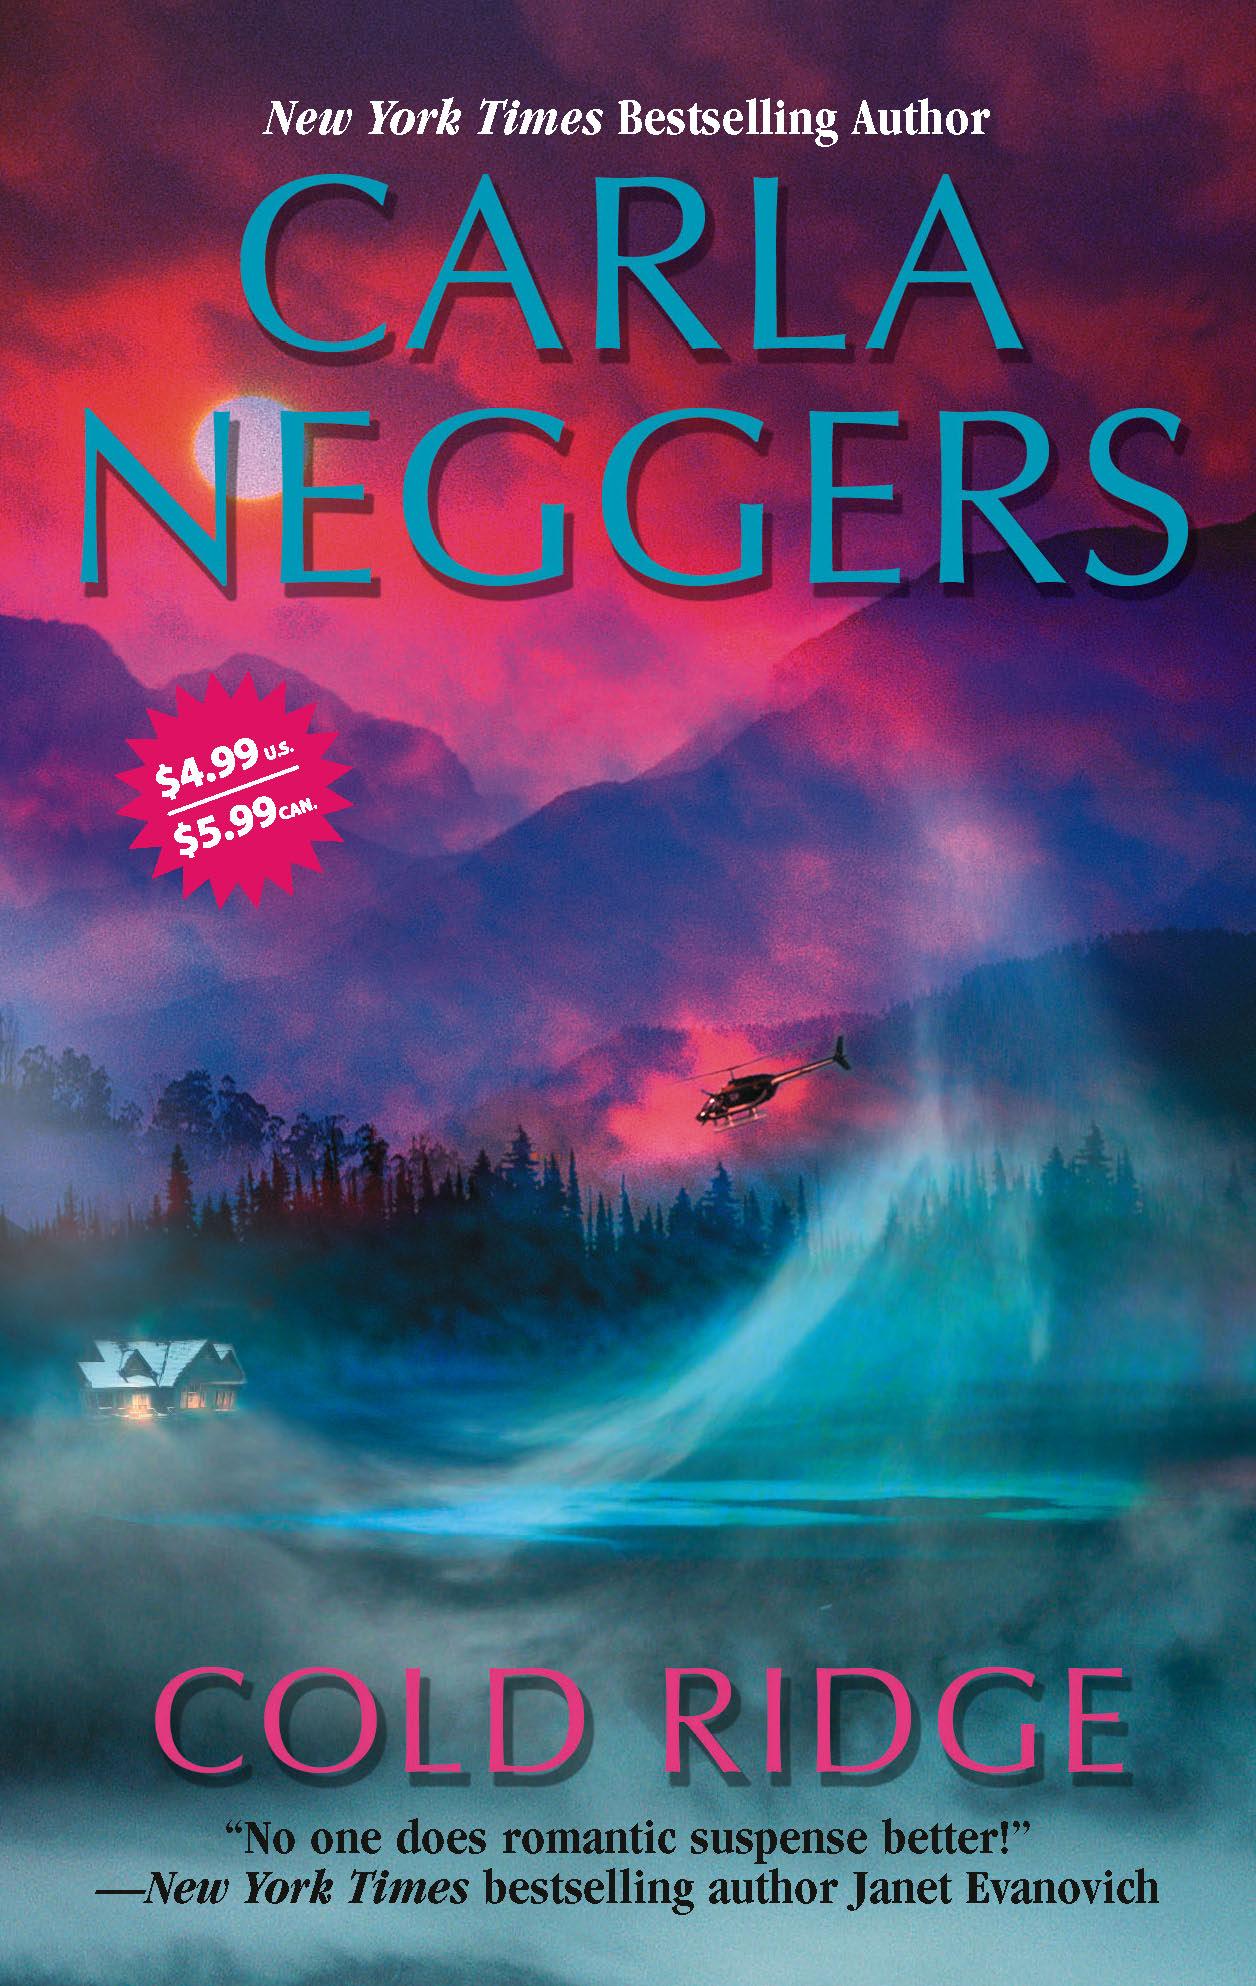 Carla Neggers Cold Ridge tyler the creator tyler the creator wolf 2 lp 180 gr cd colour